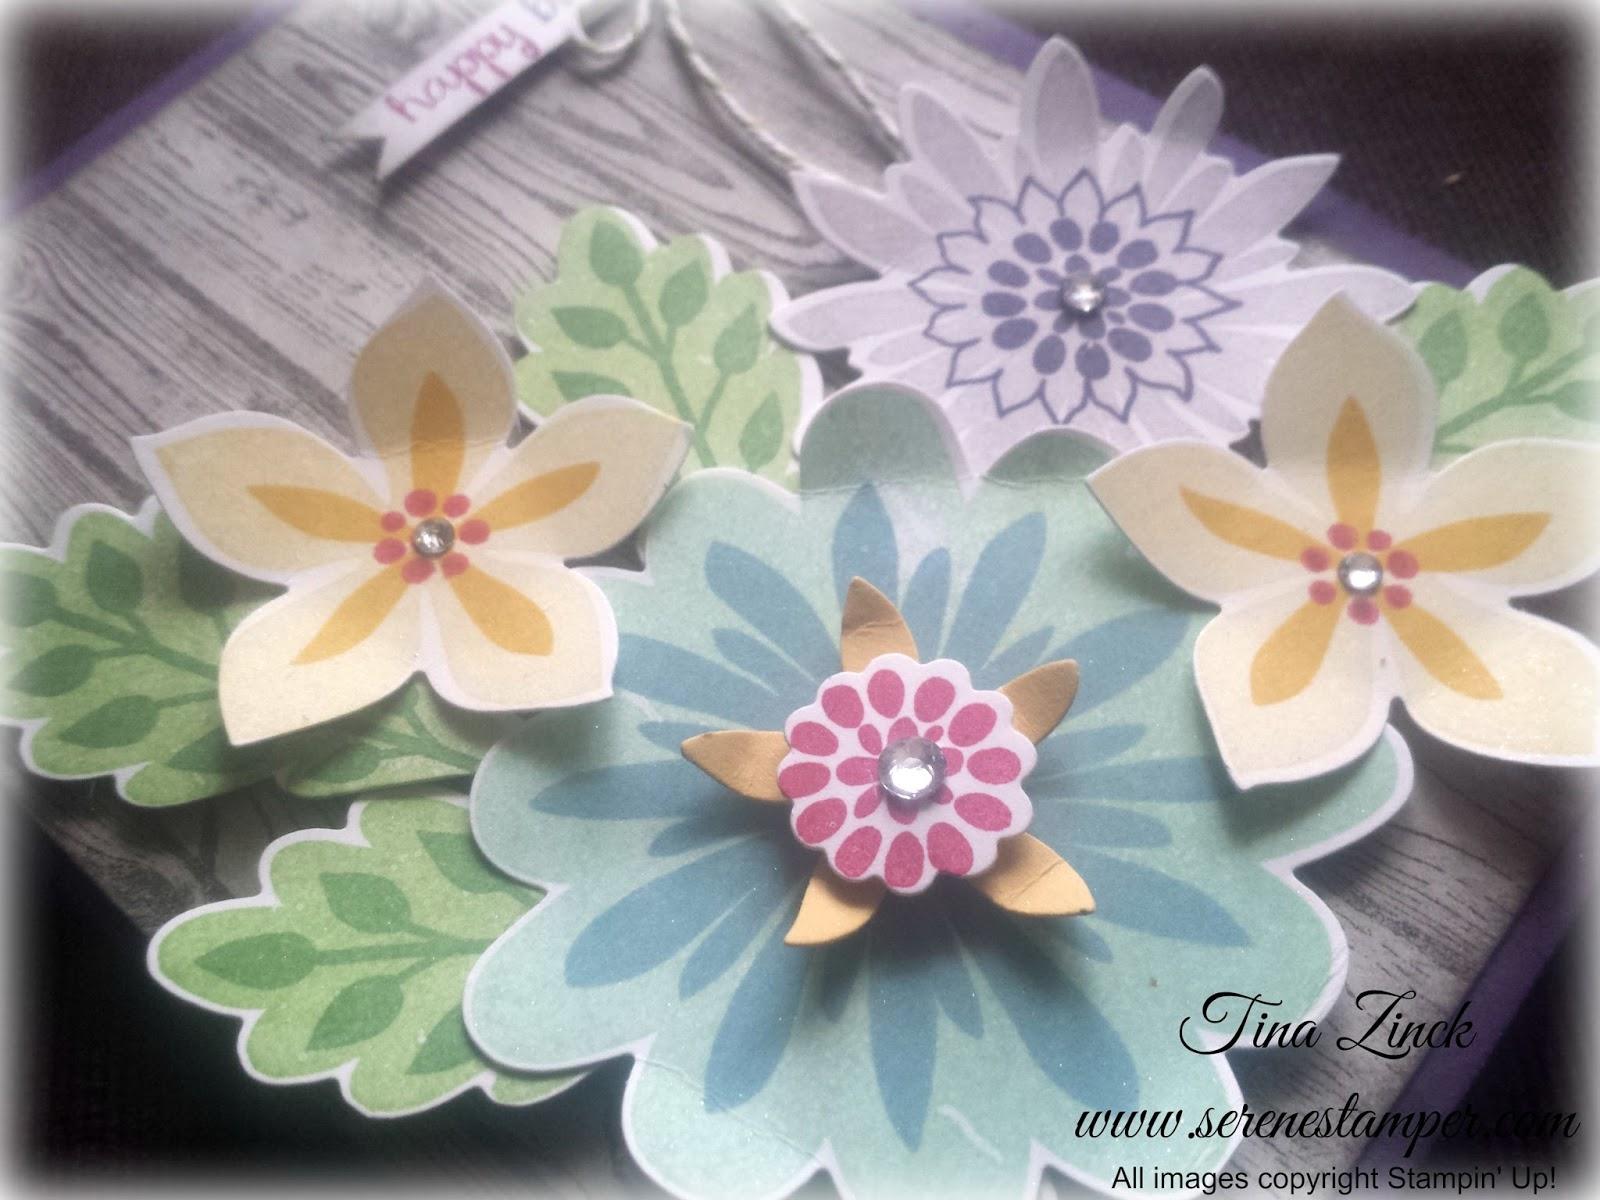 The Serene Stamper Flower Patch Birthday Card